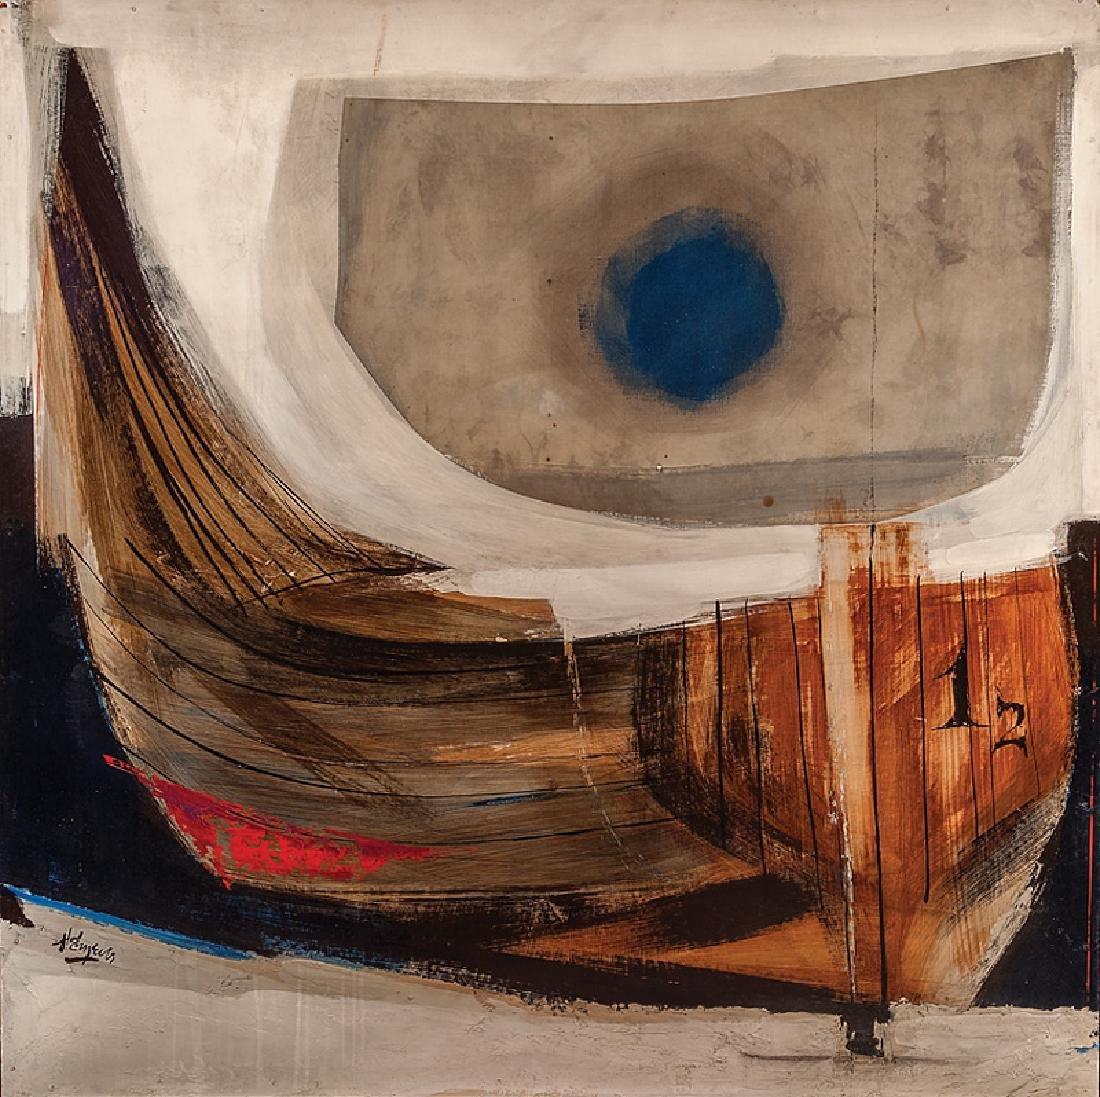 Robert Helmer (American/New Orleans, 1922-1990)